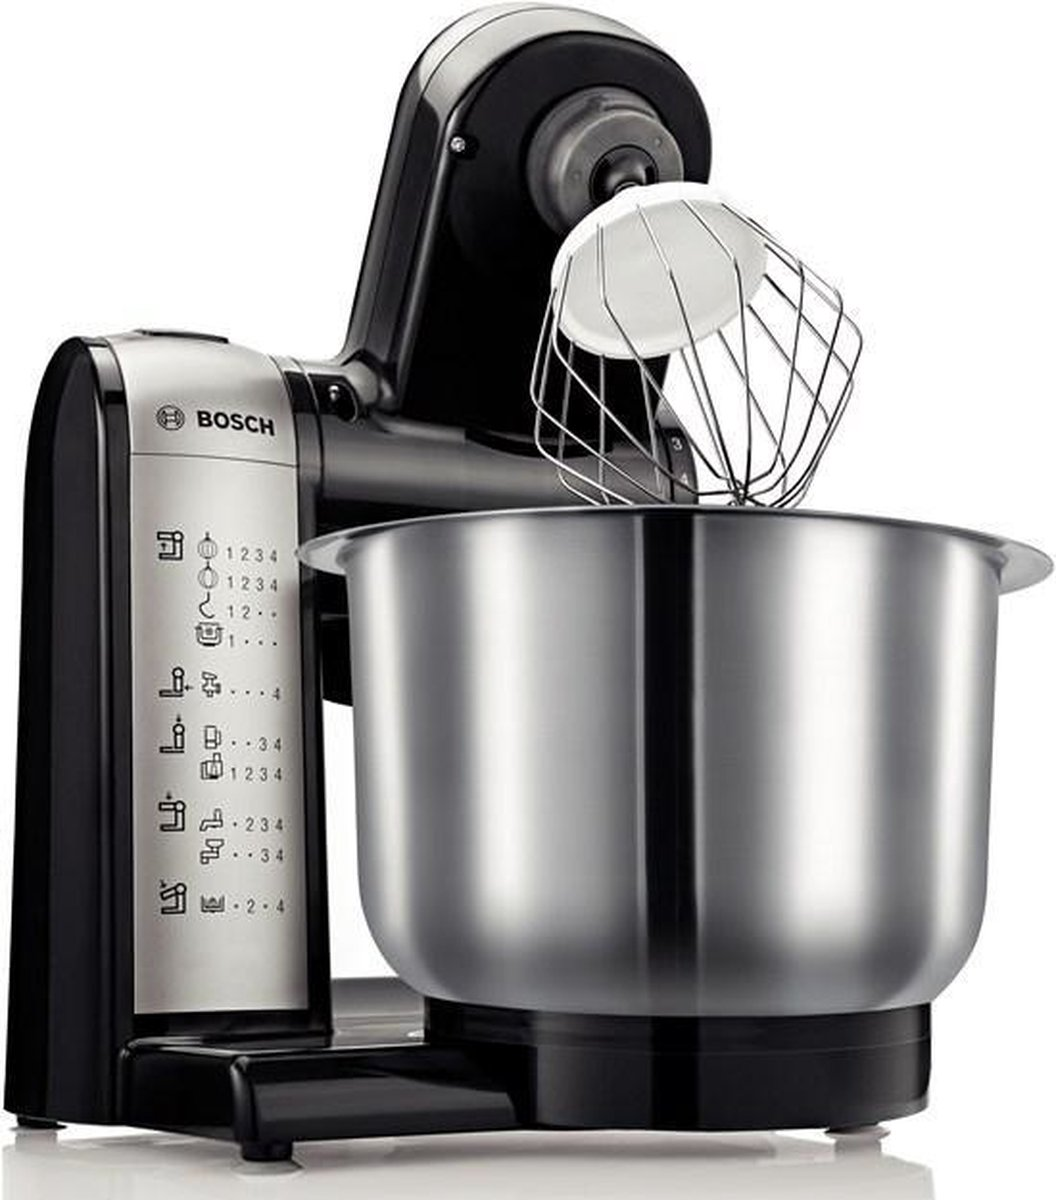 Bosch MUM48A1 – Keukenmachine – Antraciet